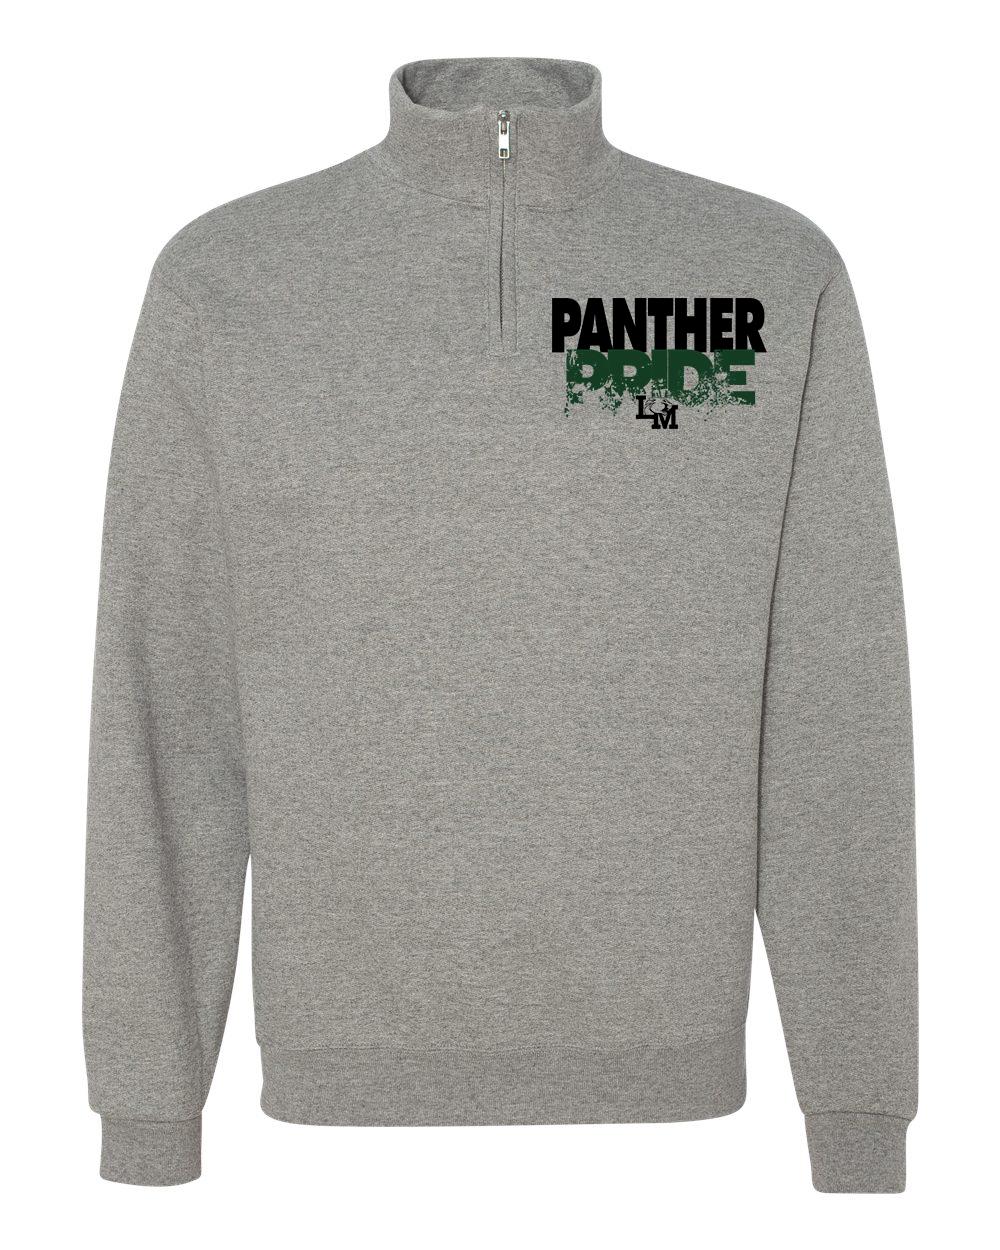 a2b76b89e LM Panther Pride 1/4-Zip Sweatshirt No Hood — Spirited by Design